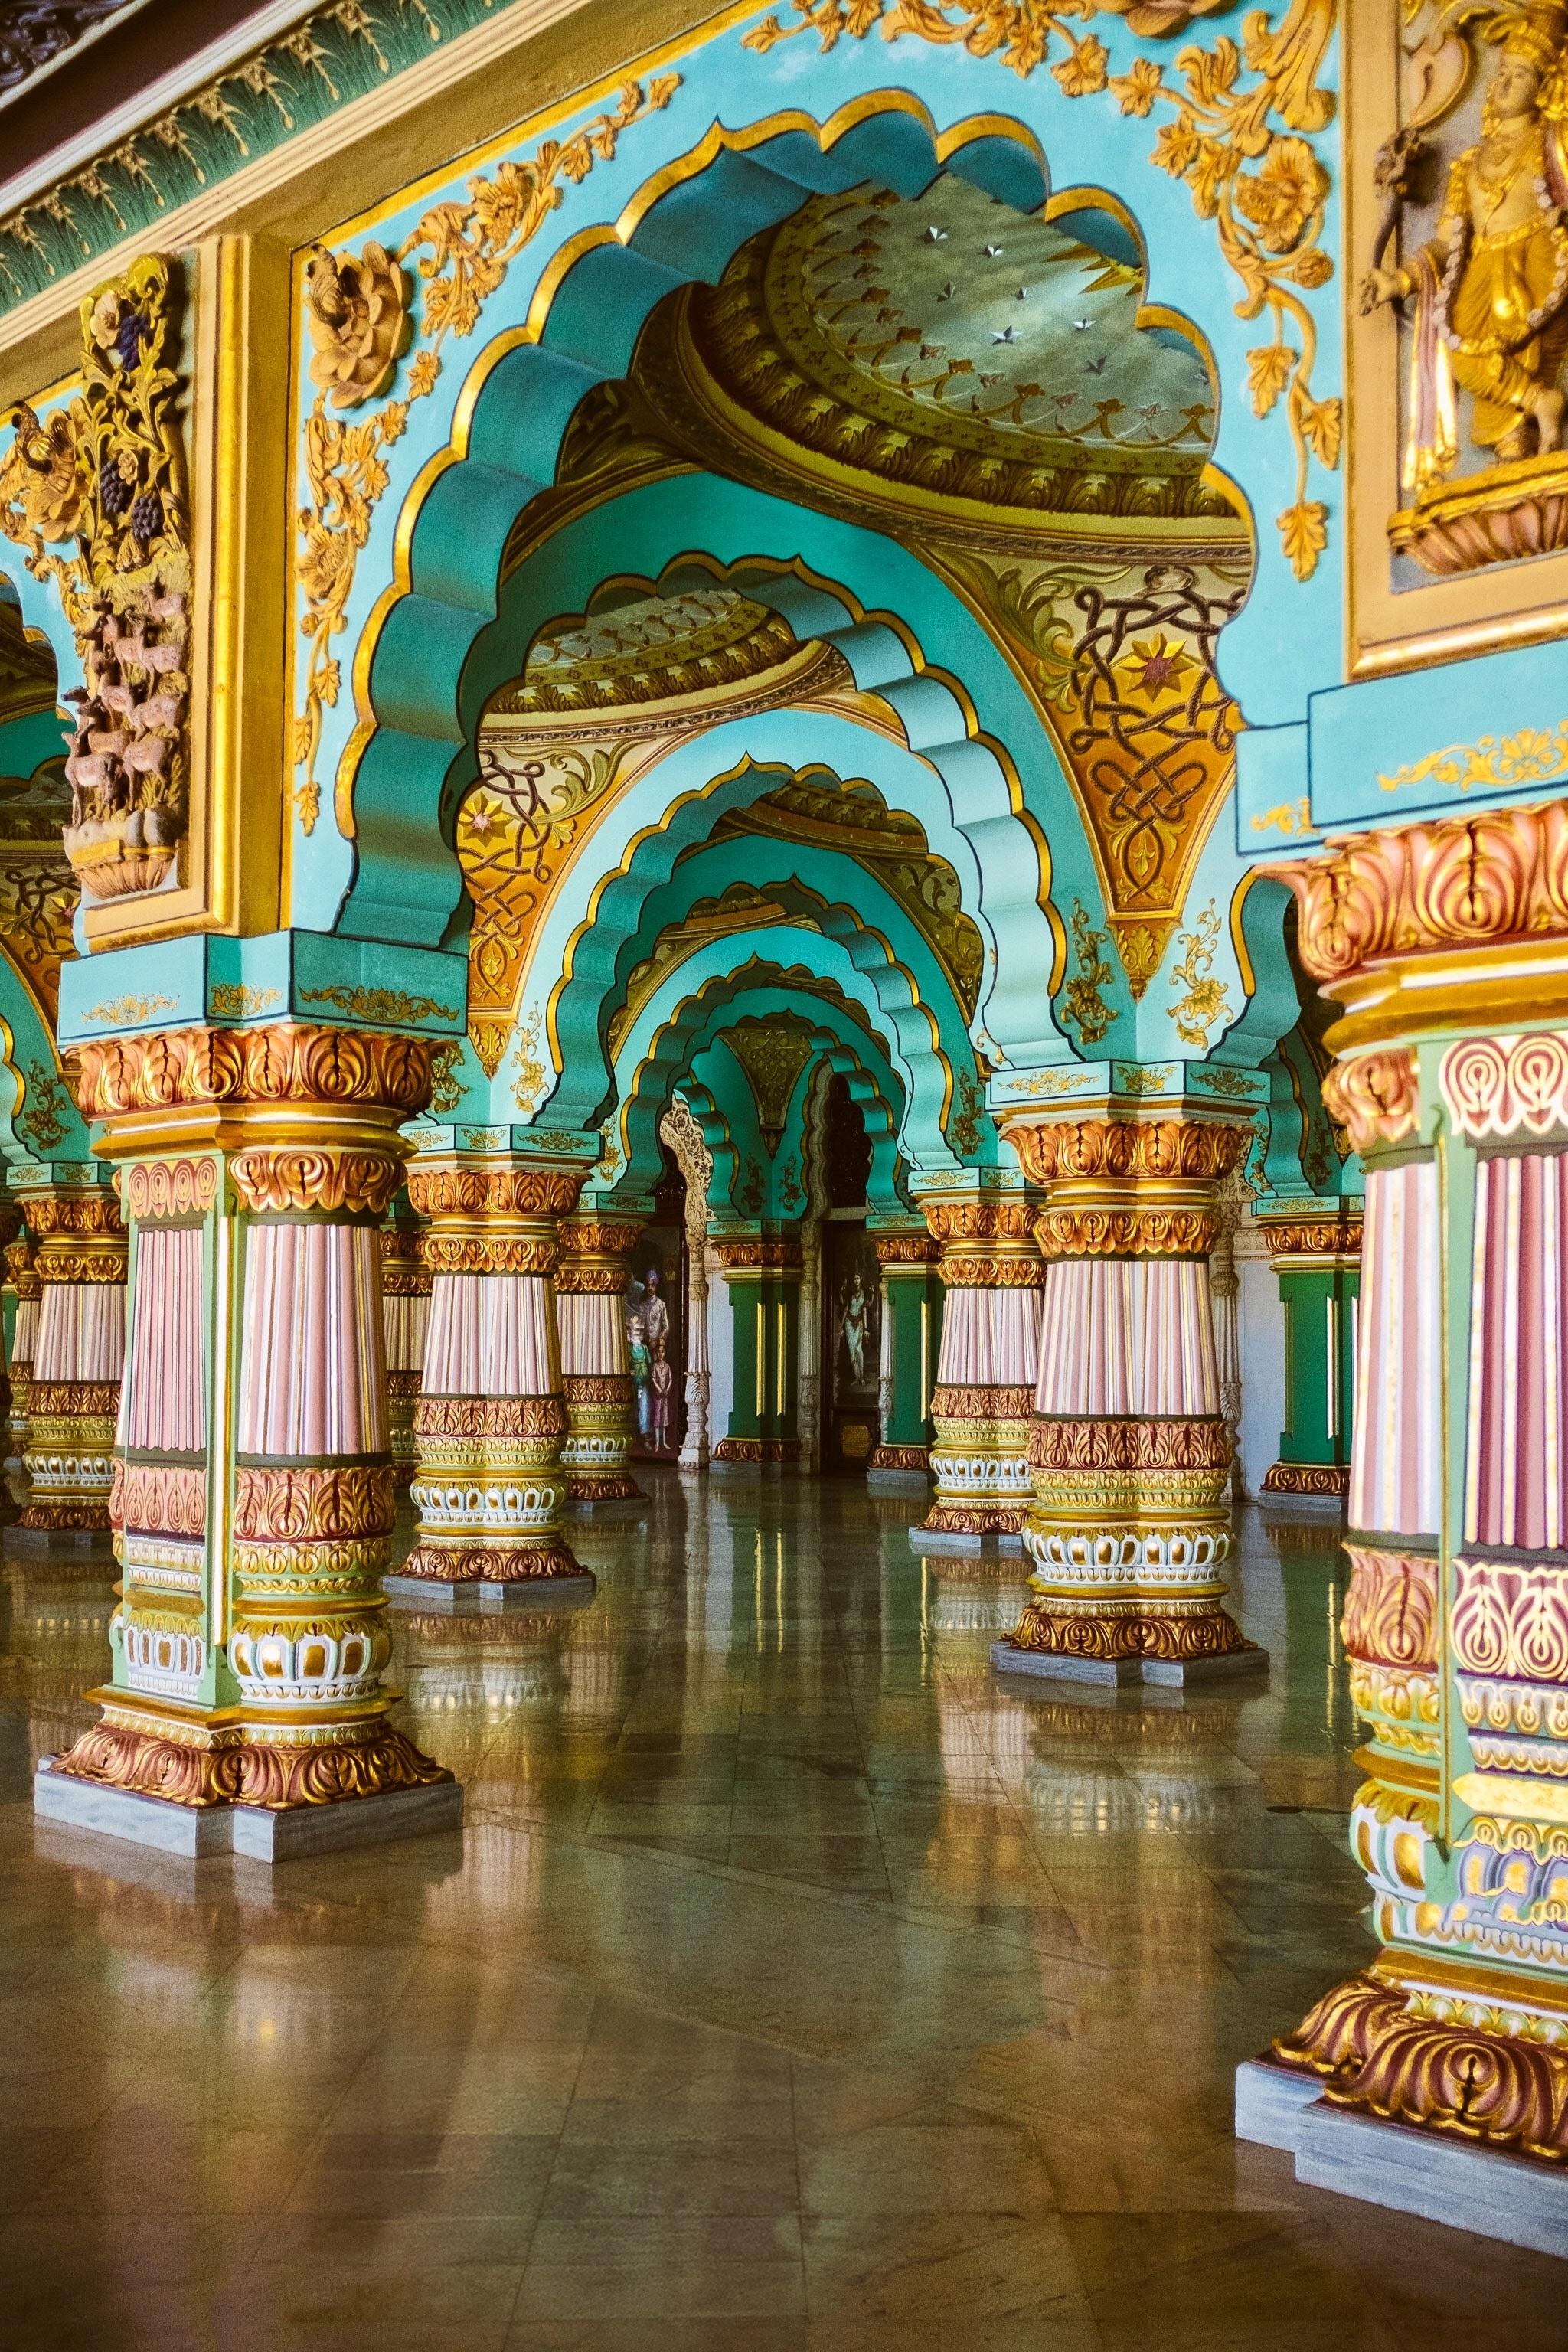 FlowTownYoga_retreat_palace_india_mysore.jpg